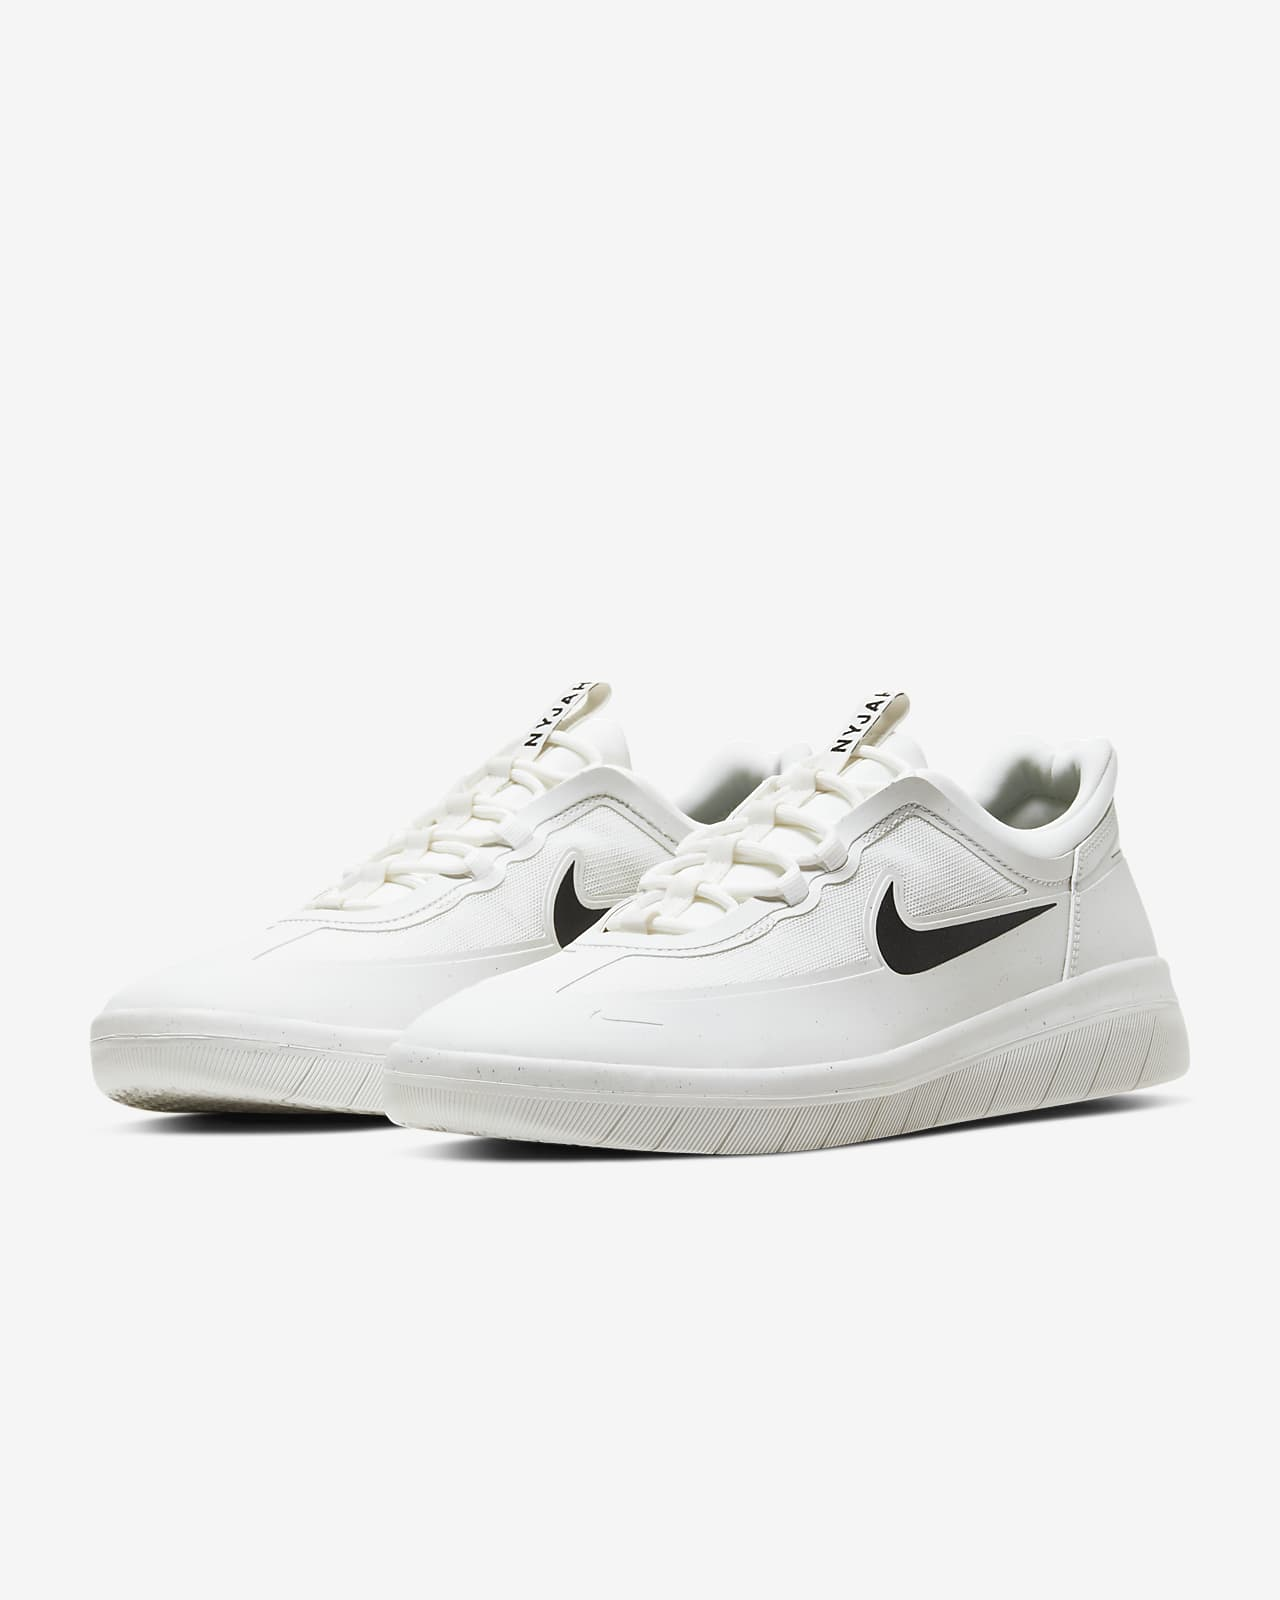 Nike SB Nyjah Free 2 Skate Shoe. Nike CA